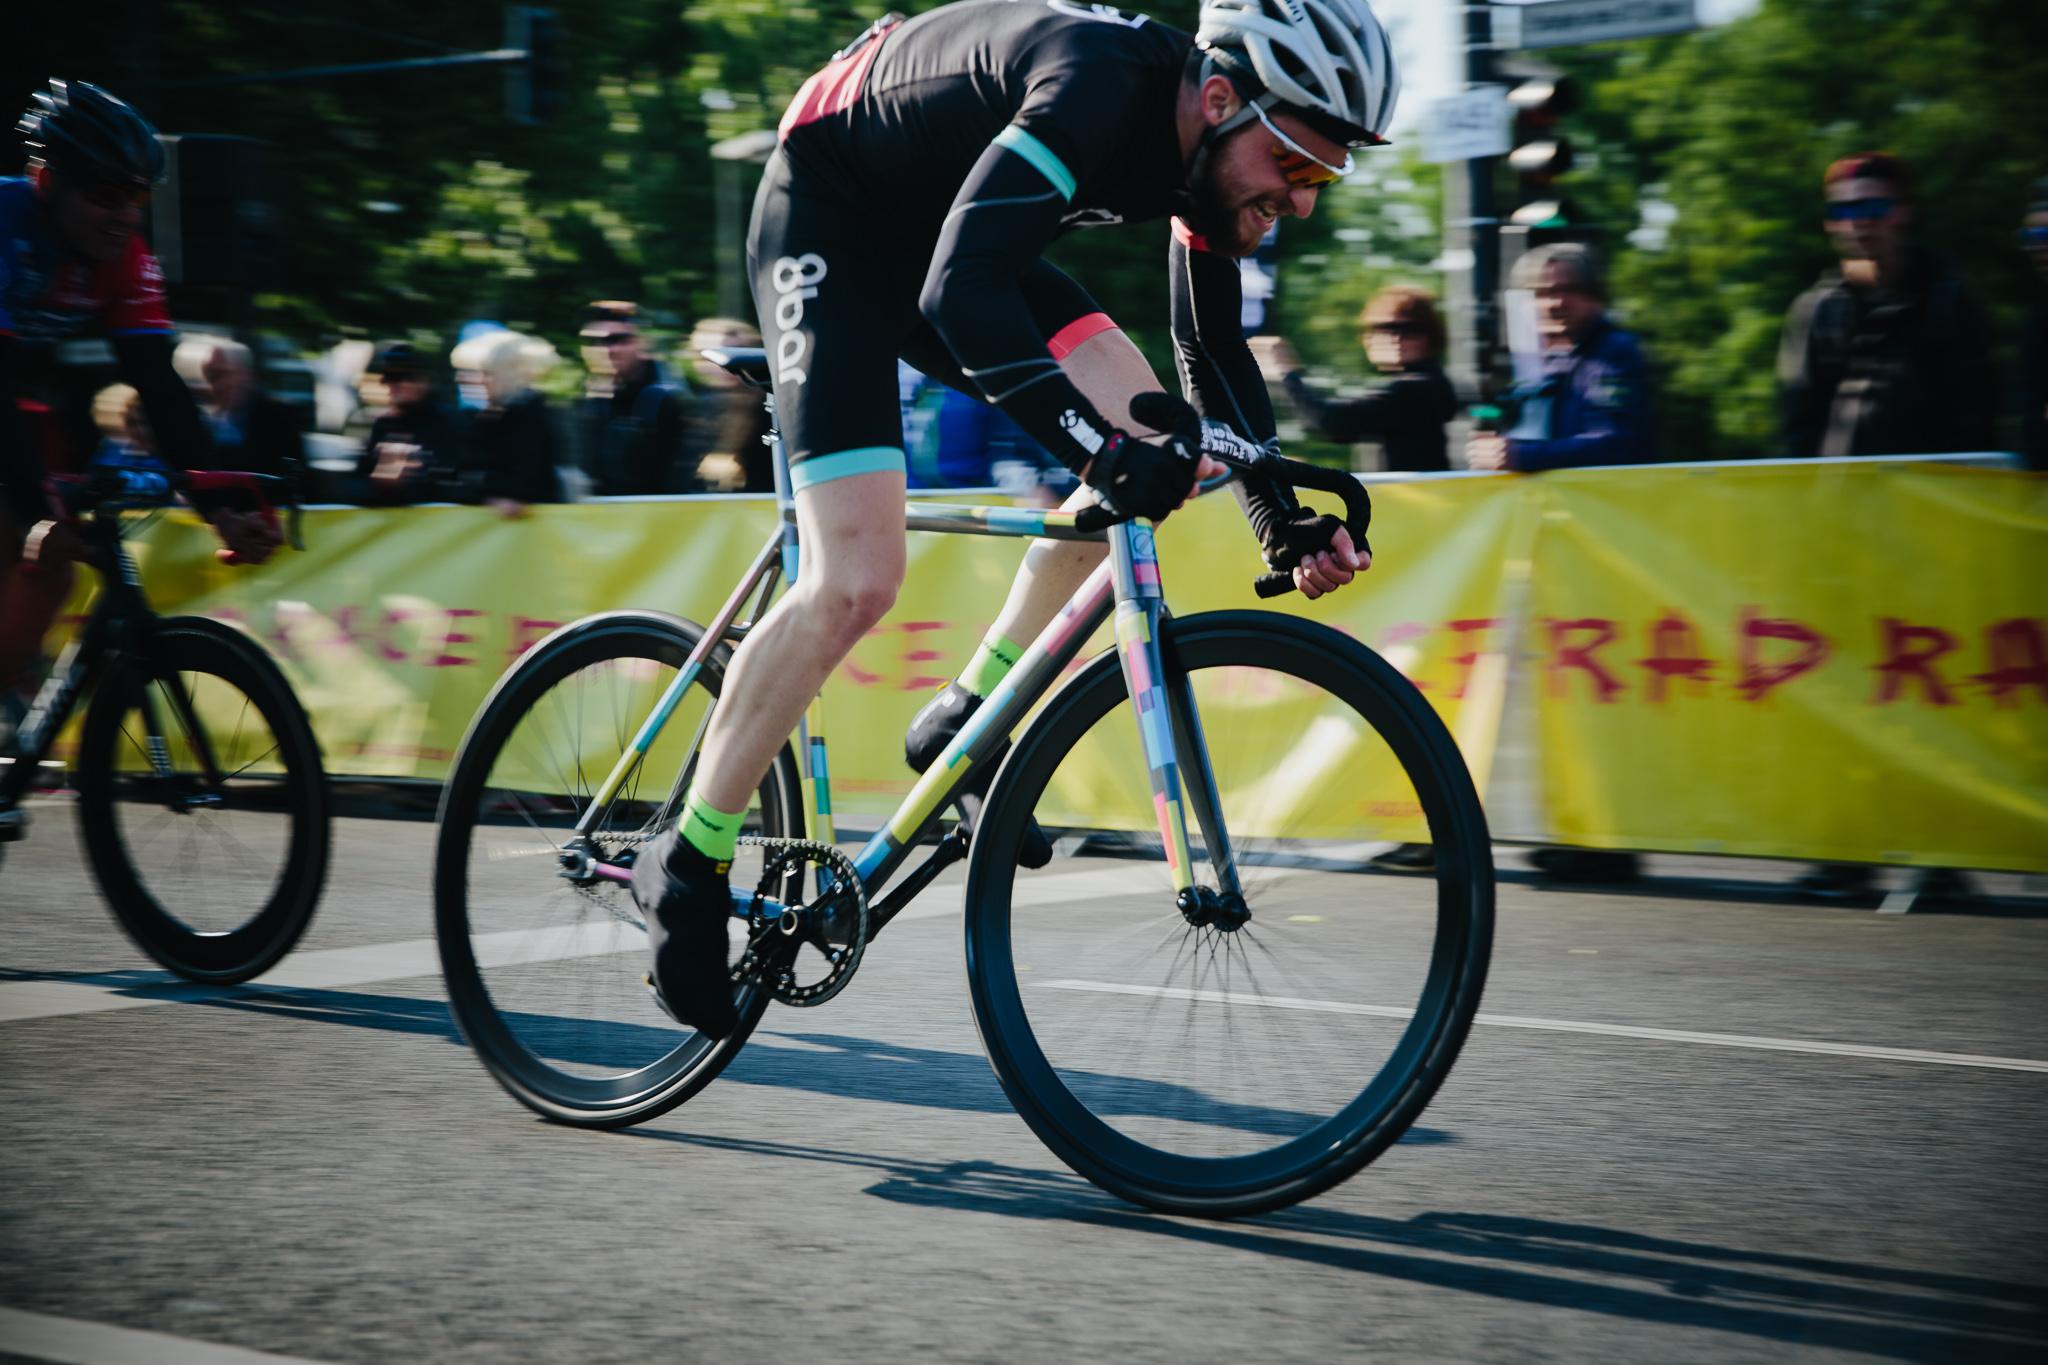 RAD RACE Battle, Berlin May 30 2015 Photo by Björn Lexius_03.jpg